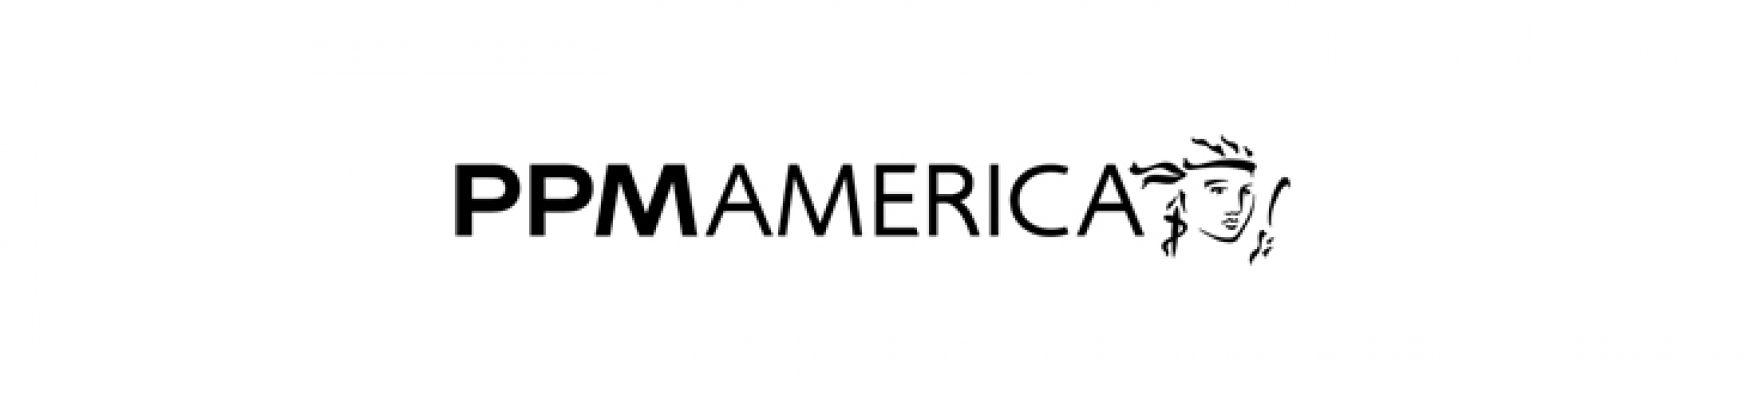 PPM-America-Logo